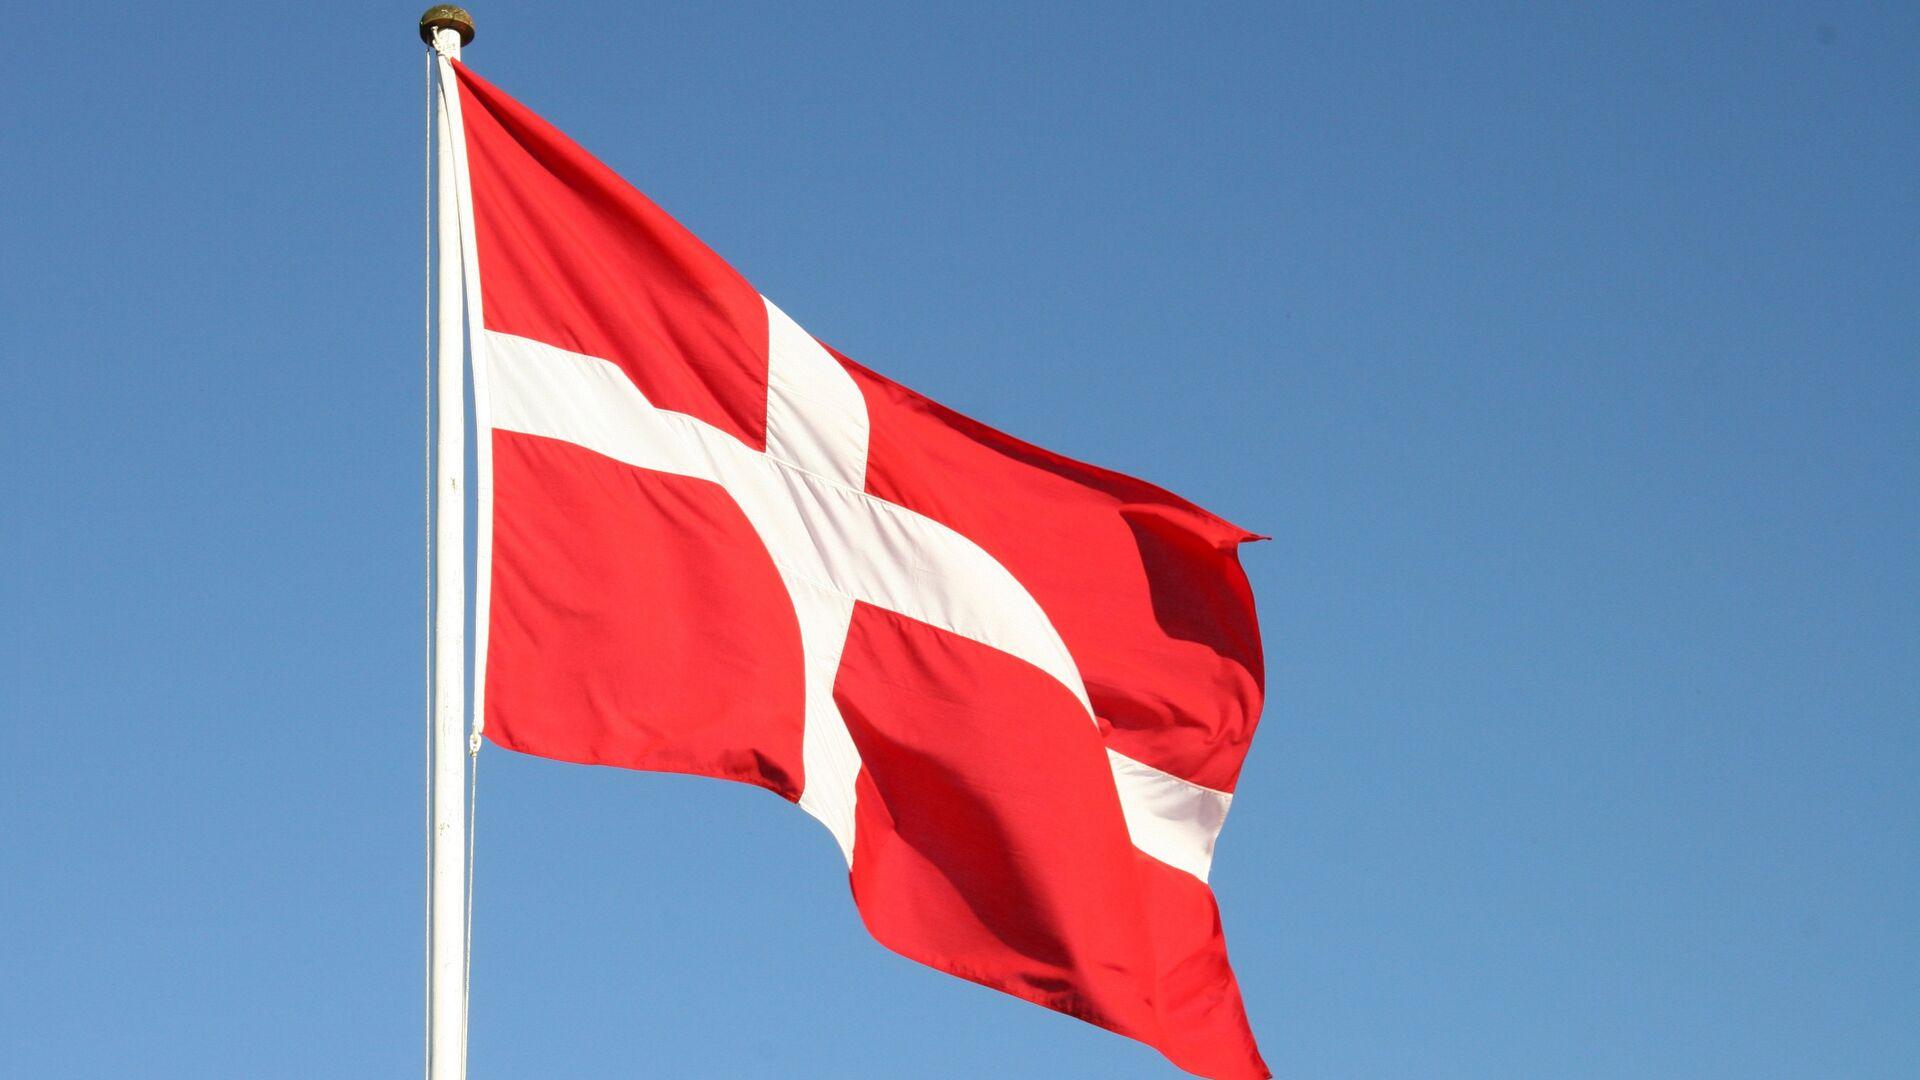 Bandera de Dinamarca - Sputnik Mundo, 1920, 27.08.2021